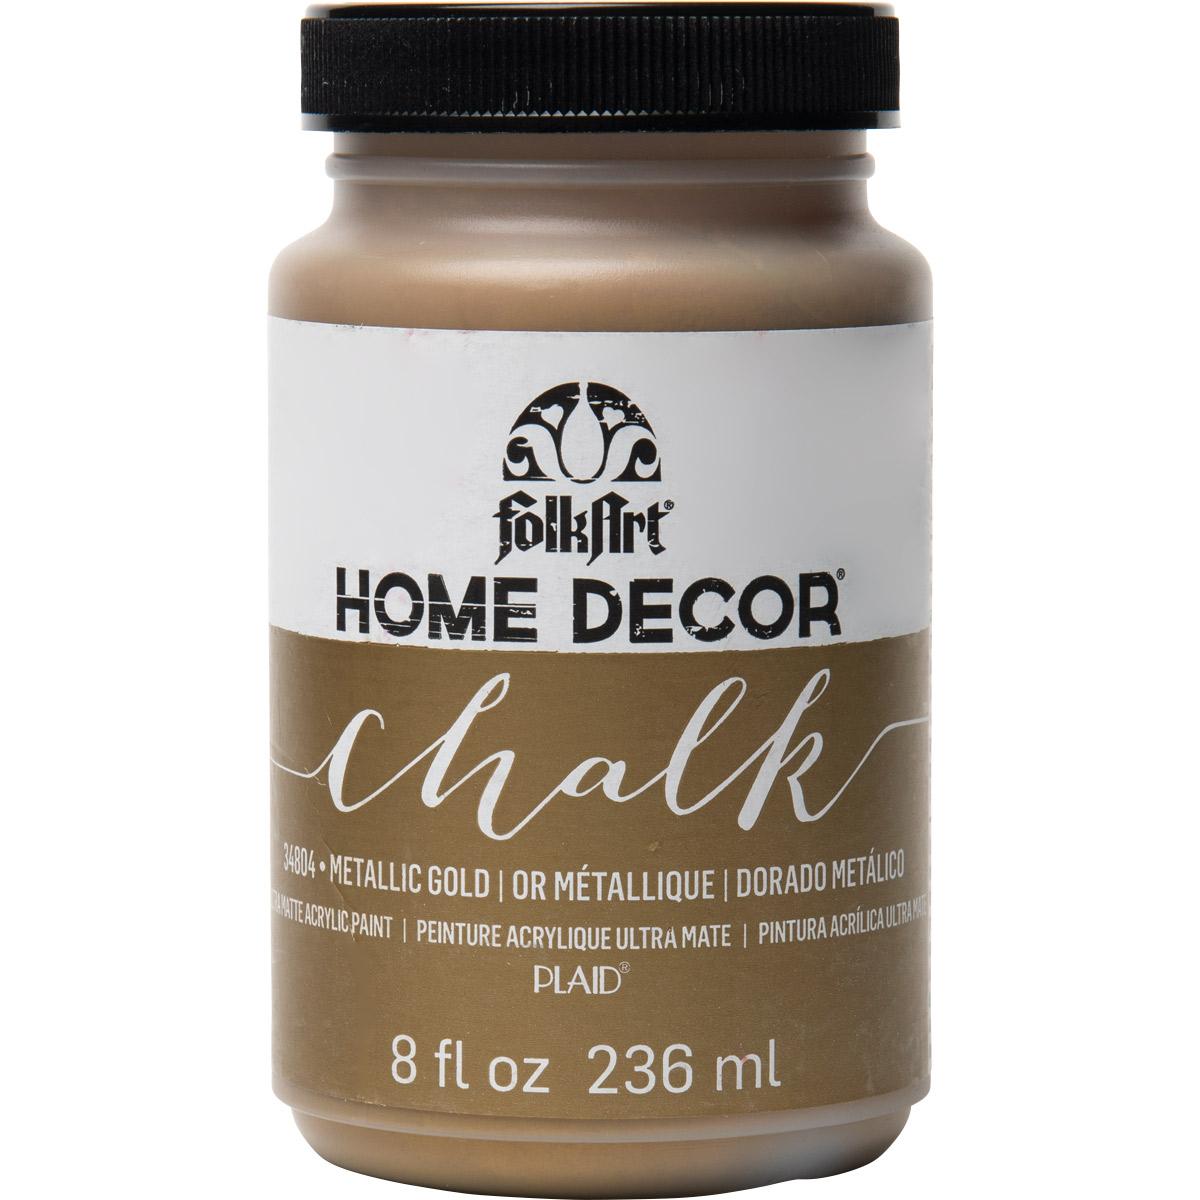 FolkArt ® Home Decor™ Chalk - Metallic Gold, 8 oz.